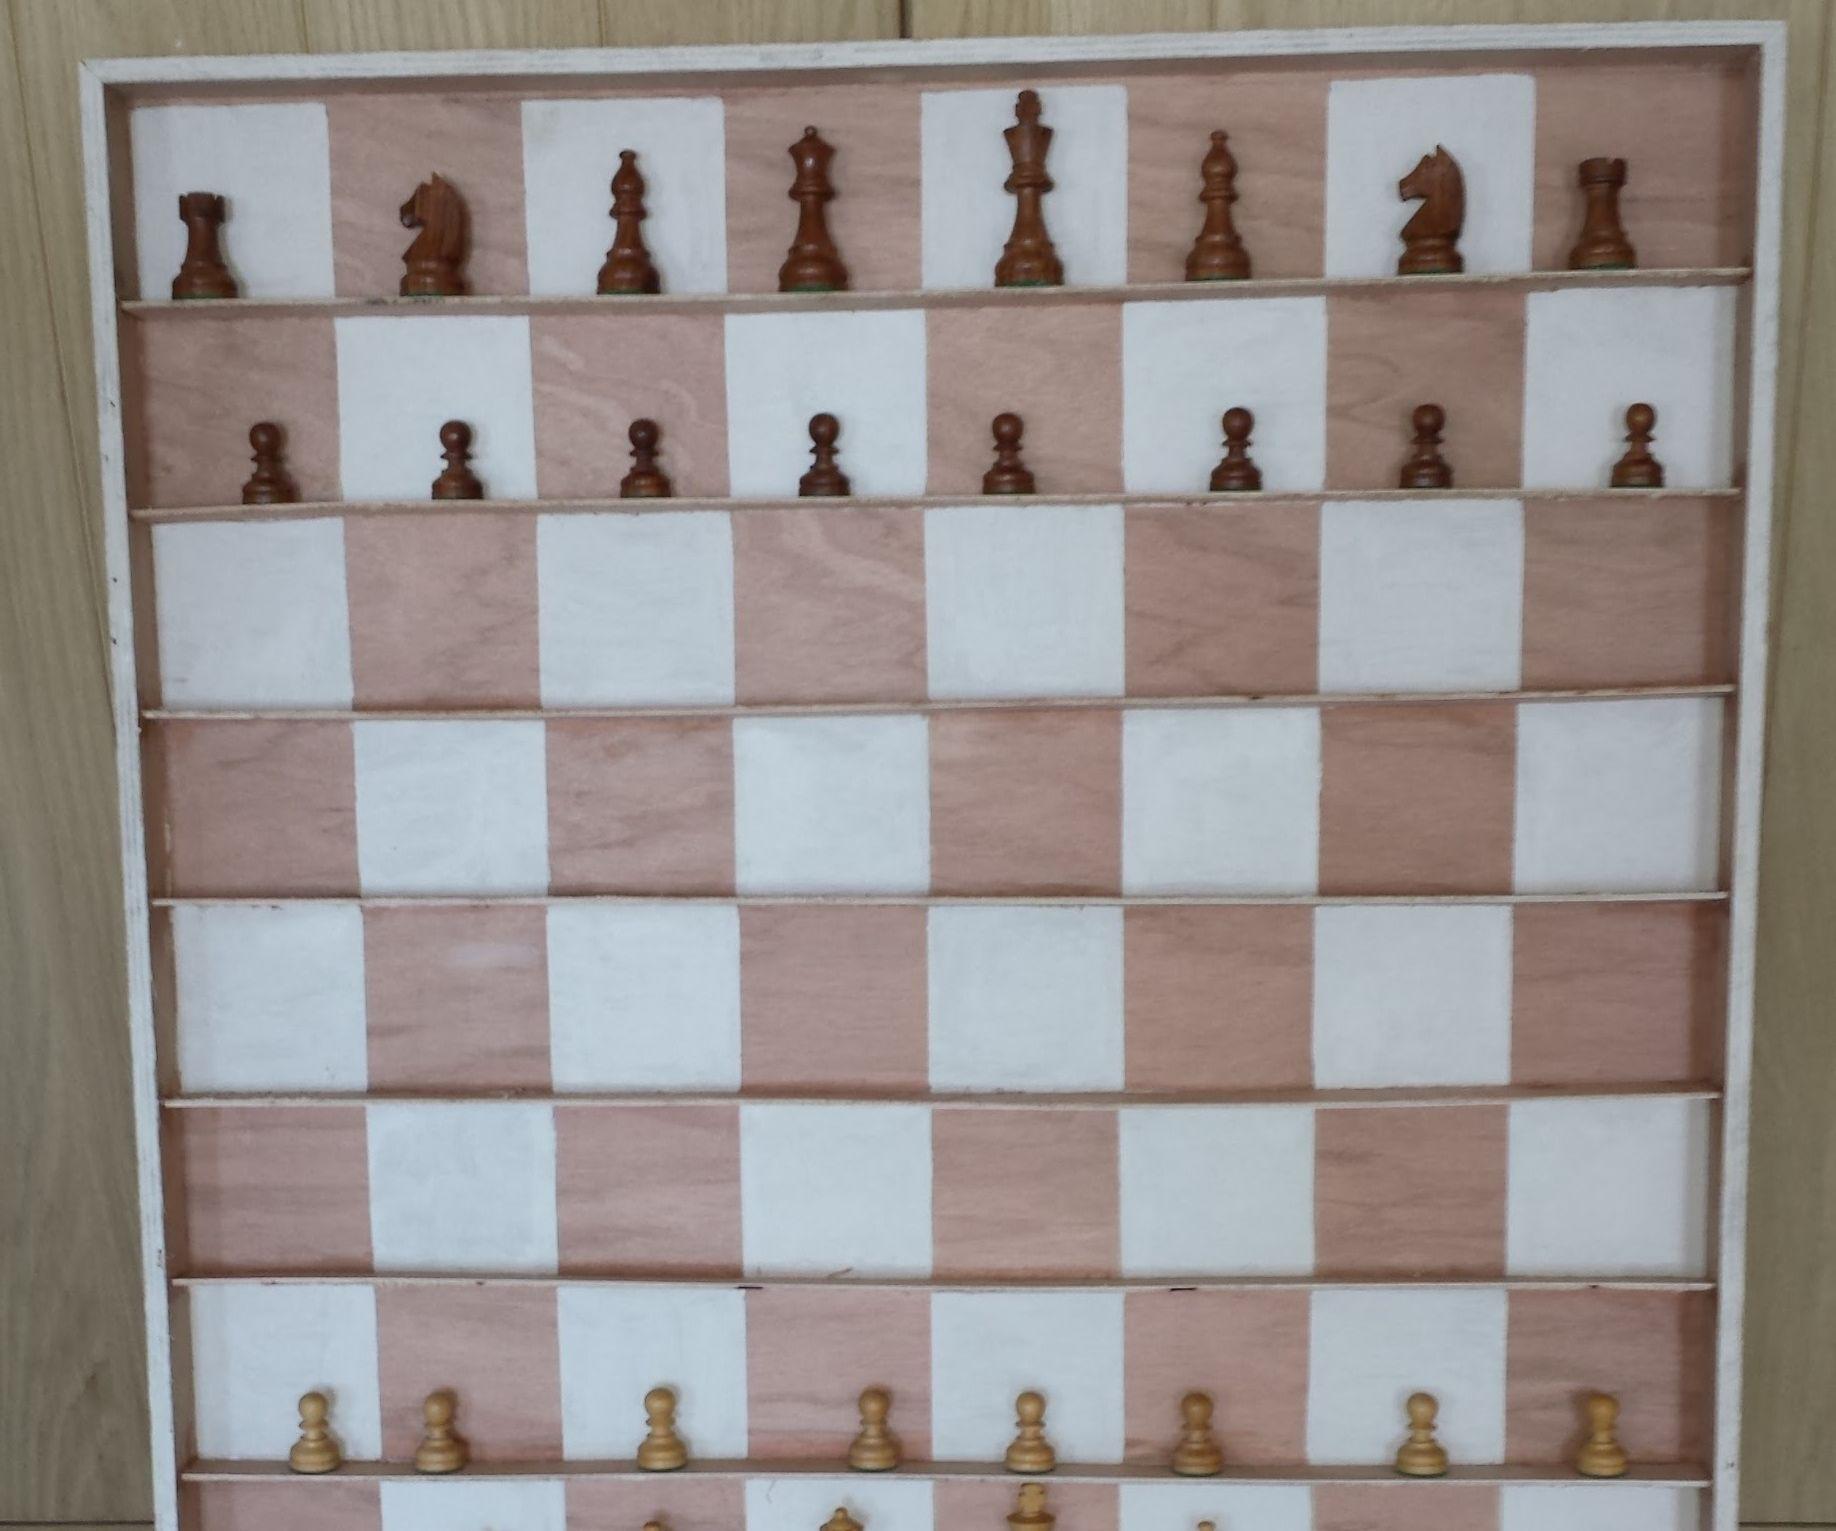 Wall Demo Chess Board